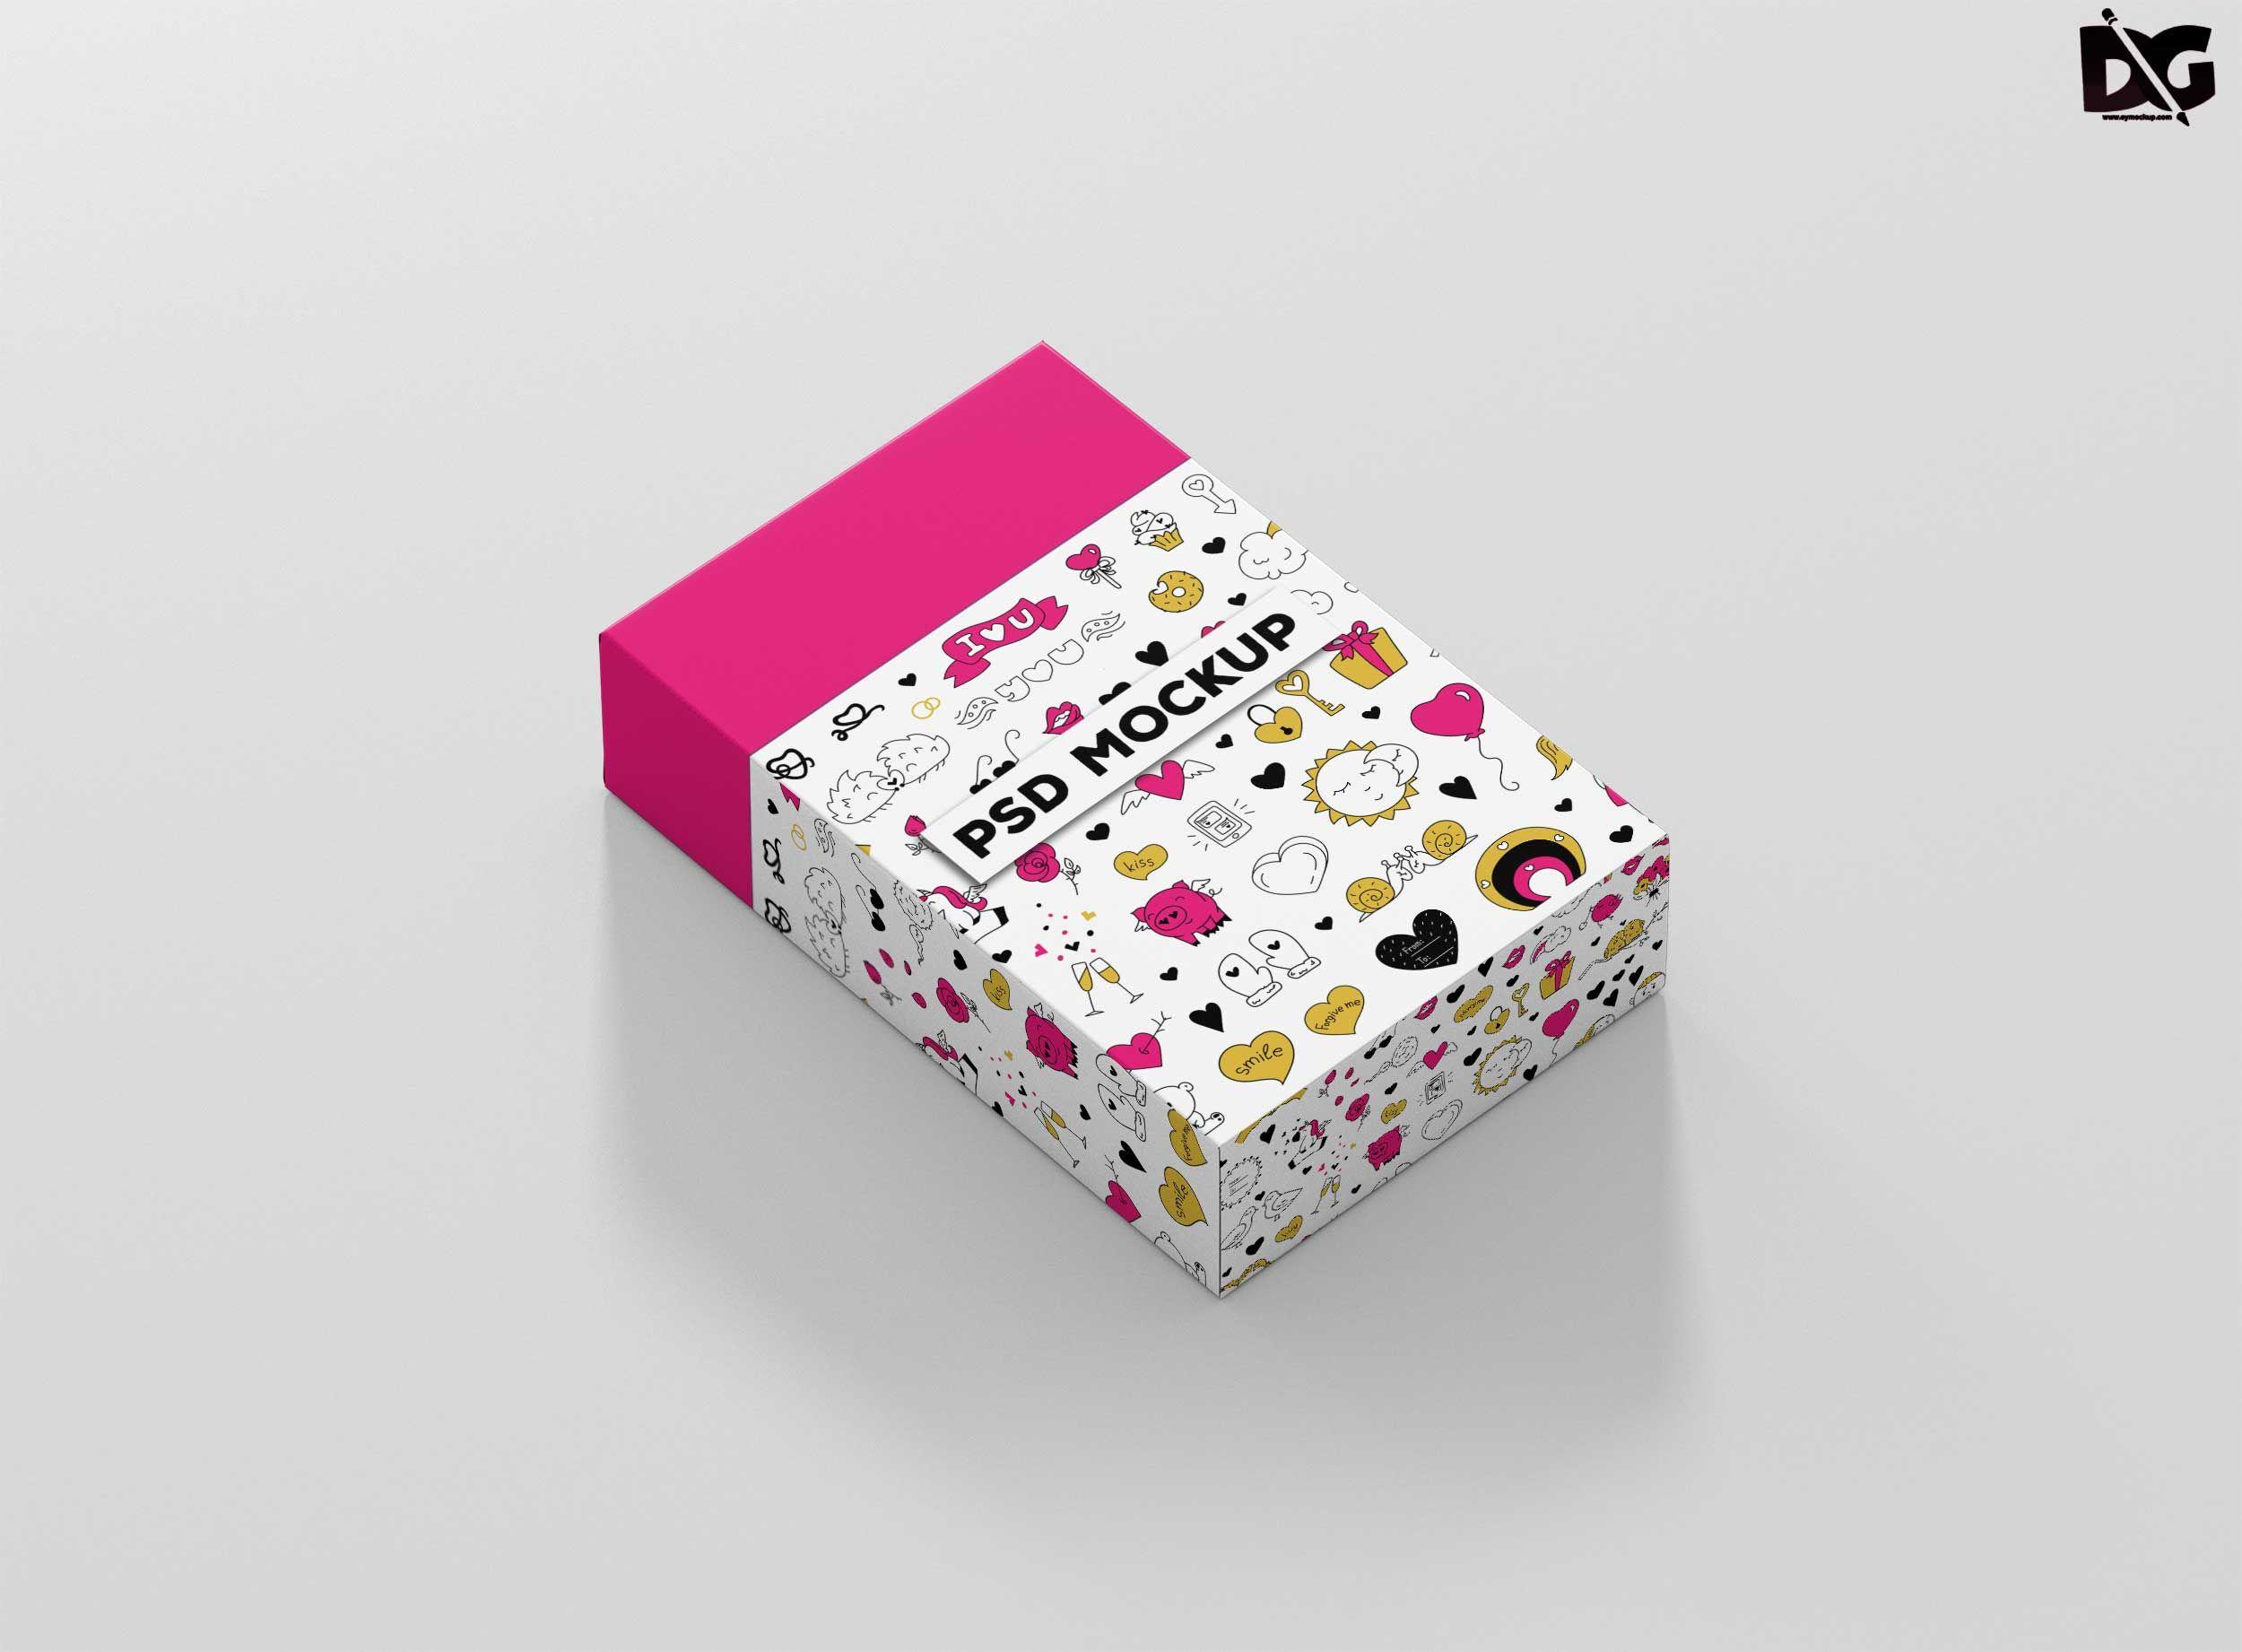 Download Free Cereal Pakage Box Mock Up Download Https Freepsdmock Up Com Free Cereal Pakage Box Mock Up Download B In 2021 Mockup Free Psd Free Logo Mockup Free Logo Psd